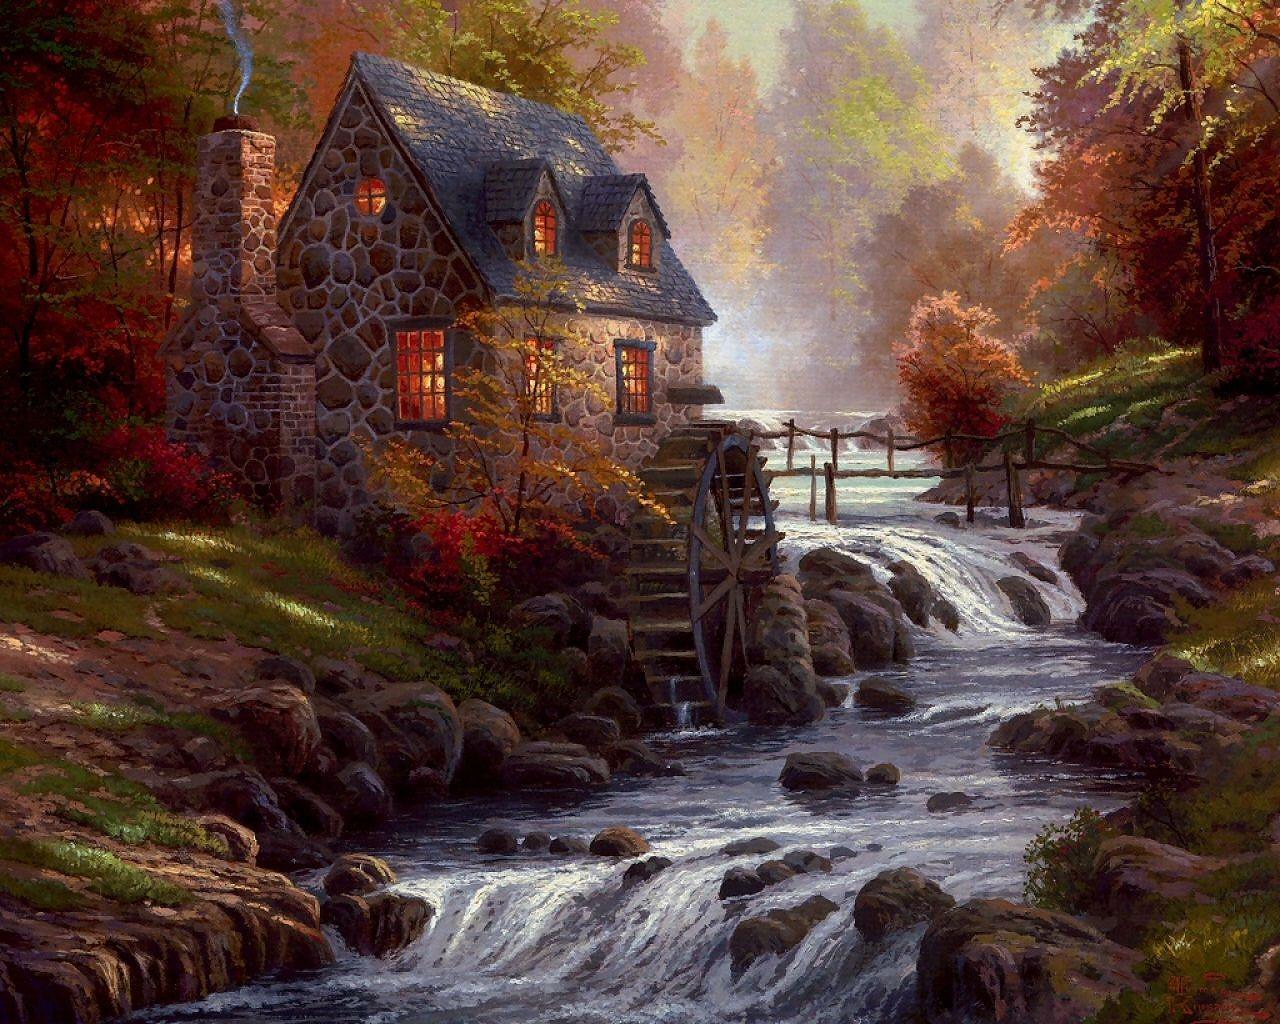 Thomas Kinkade Wallpapers Art Paintings Desktop Wallpaper 1280x1024